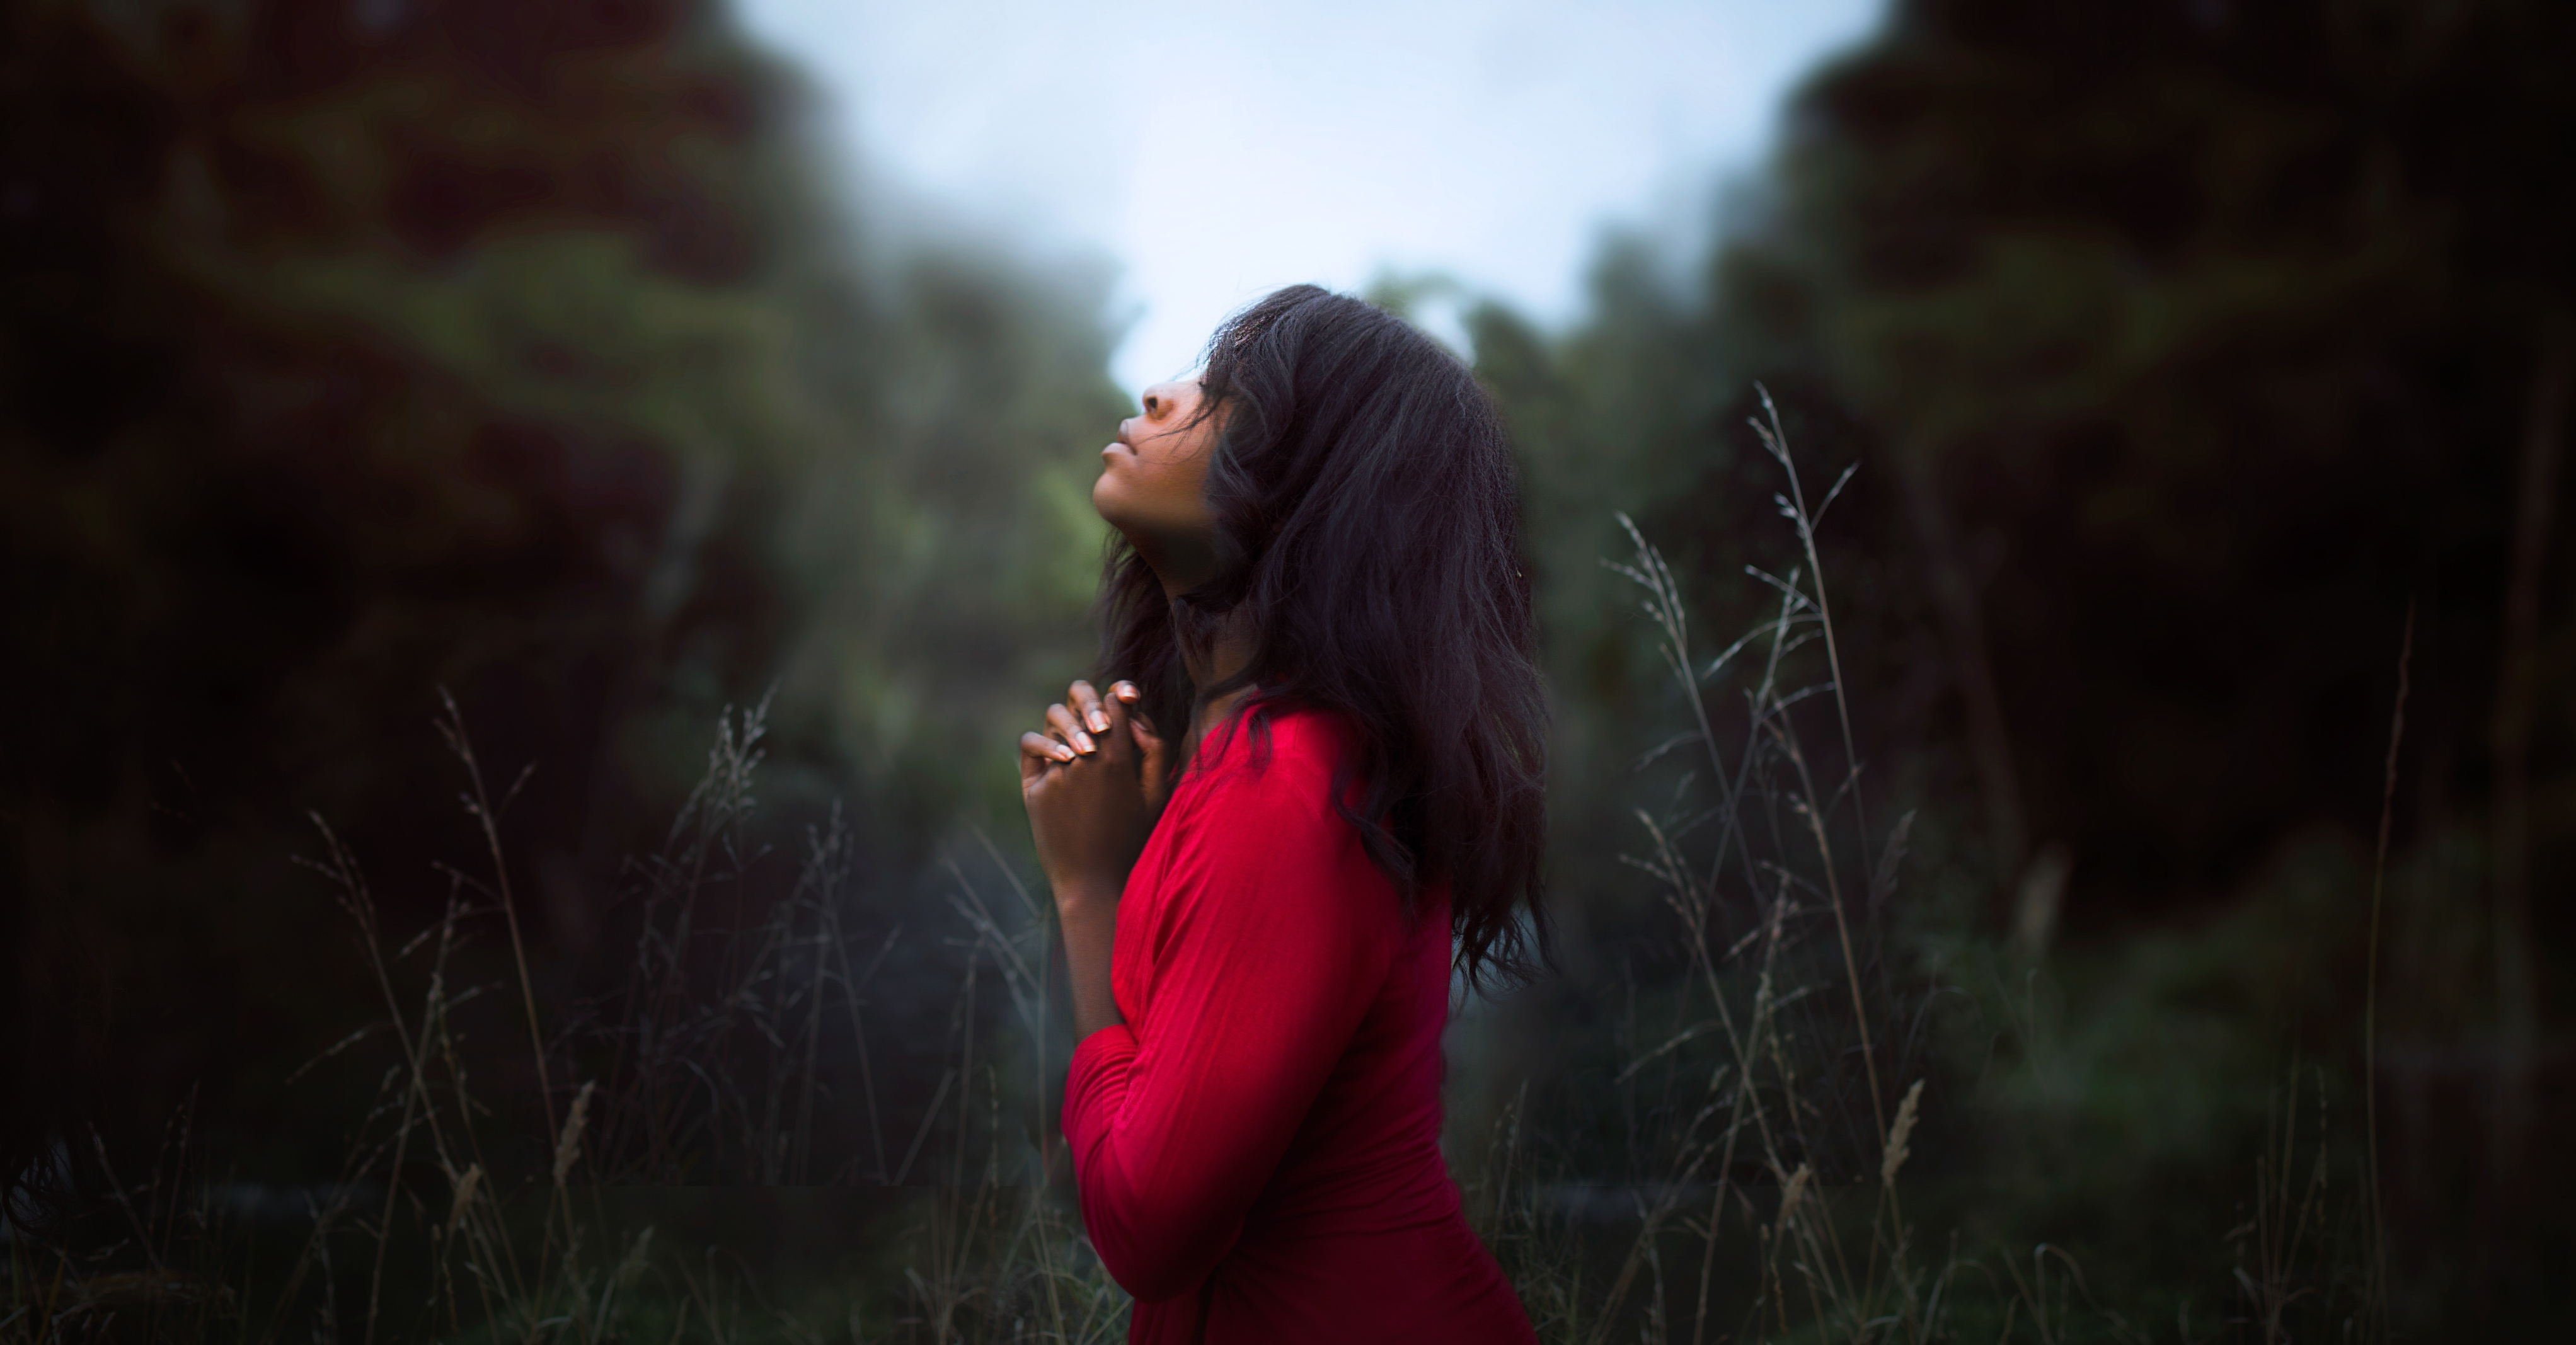 How Do I Get Started Praying?